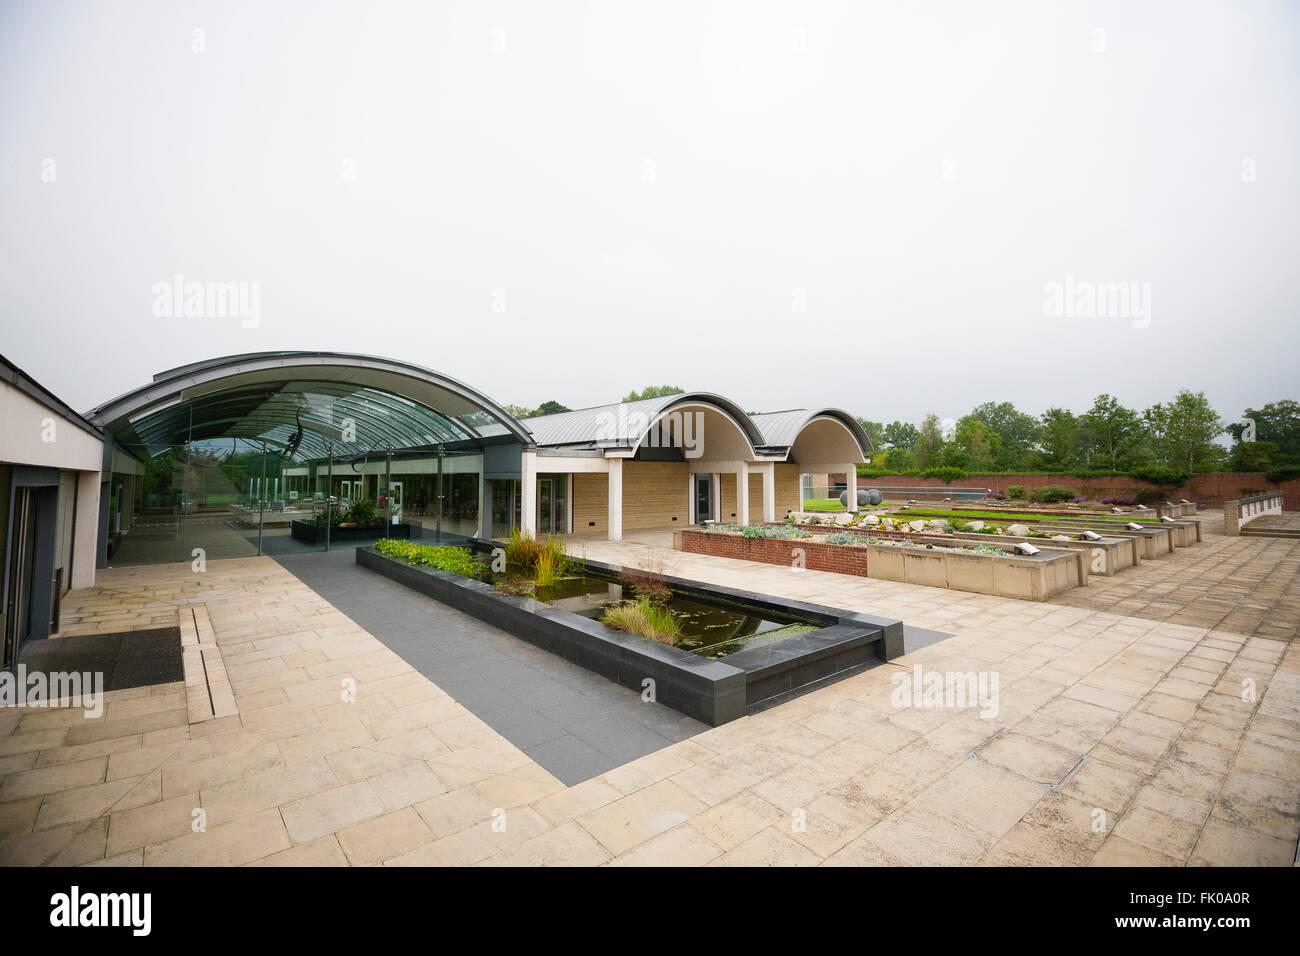 Kew Millennium Seedbank, West Sussex, UK. External view of Millenium seed bank visitor's centre. - Stock Image